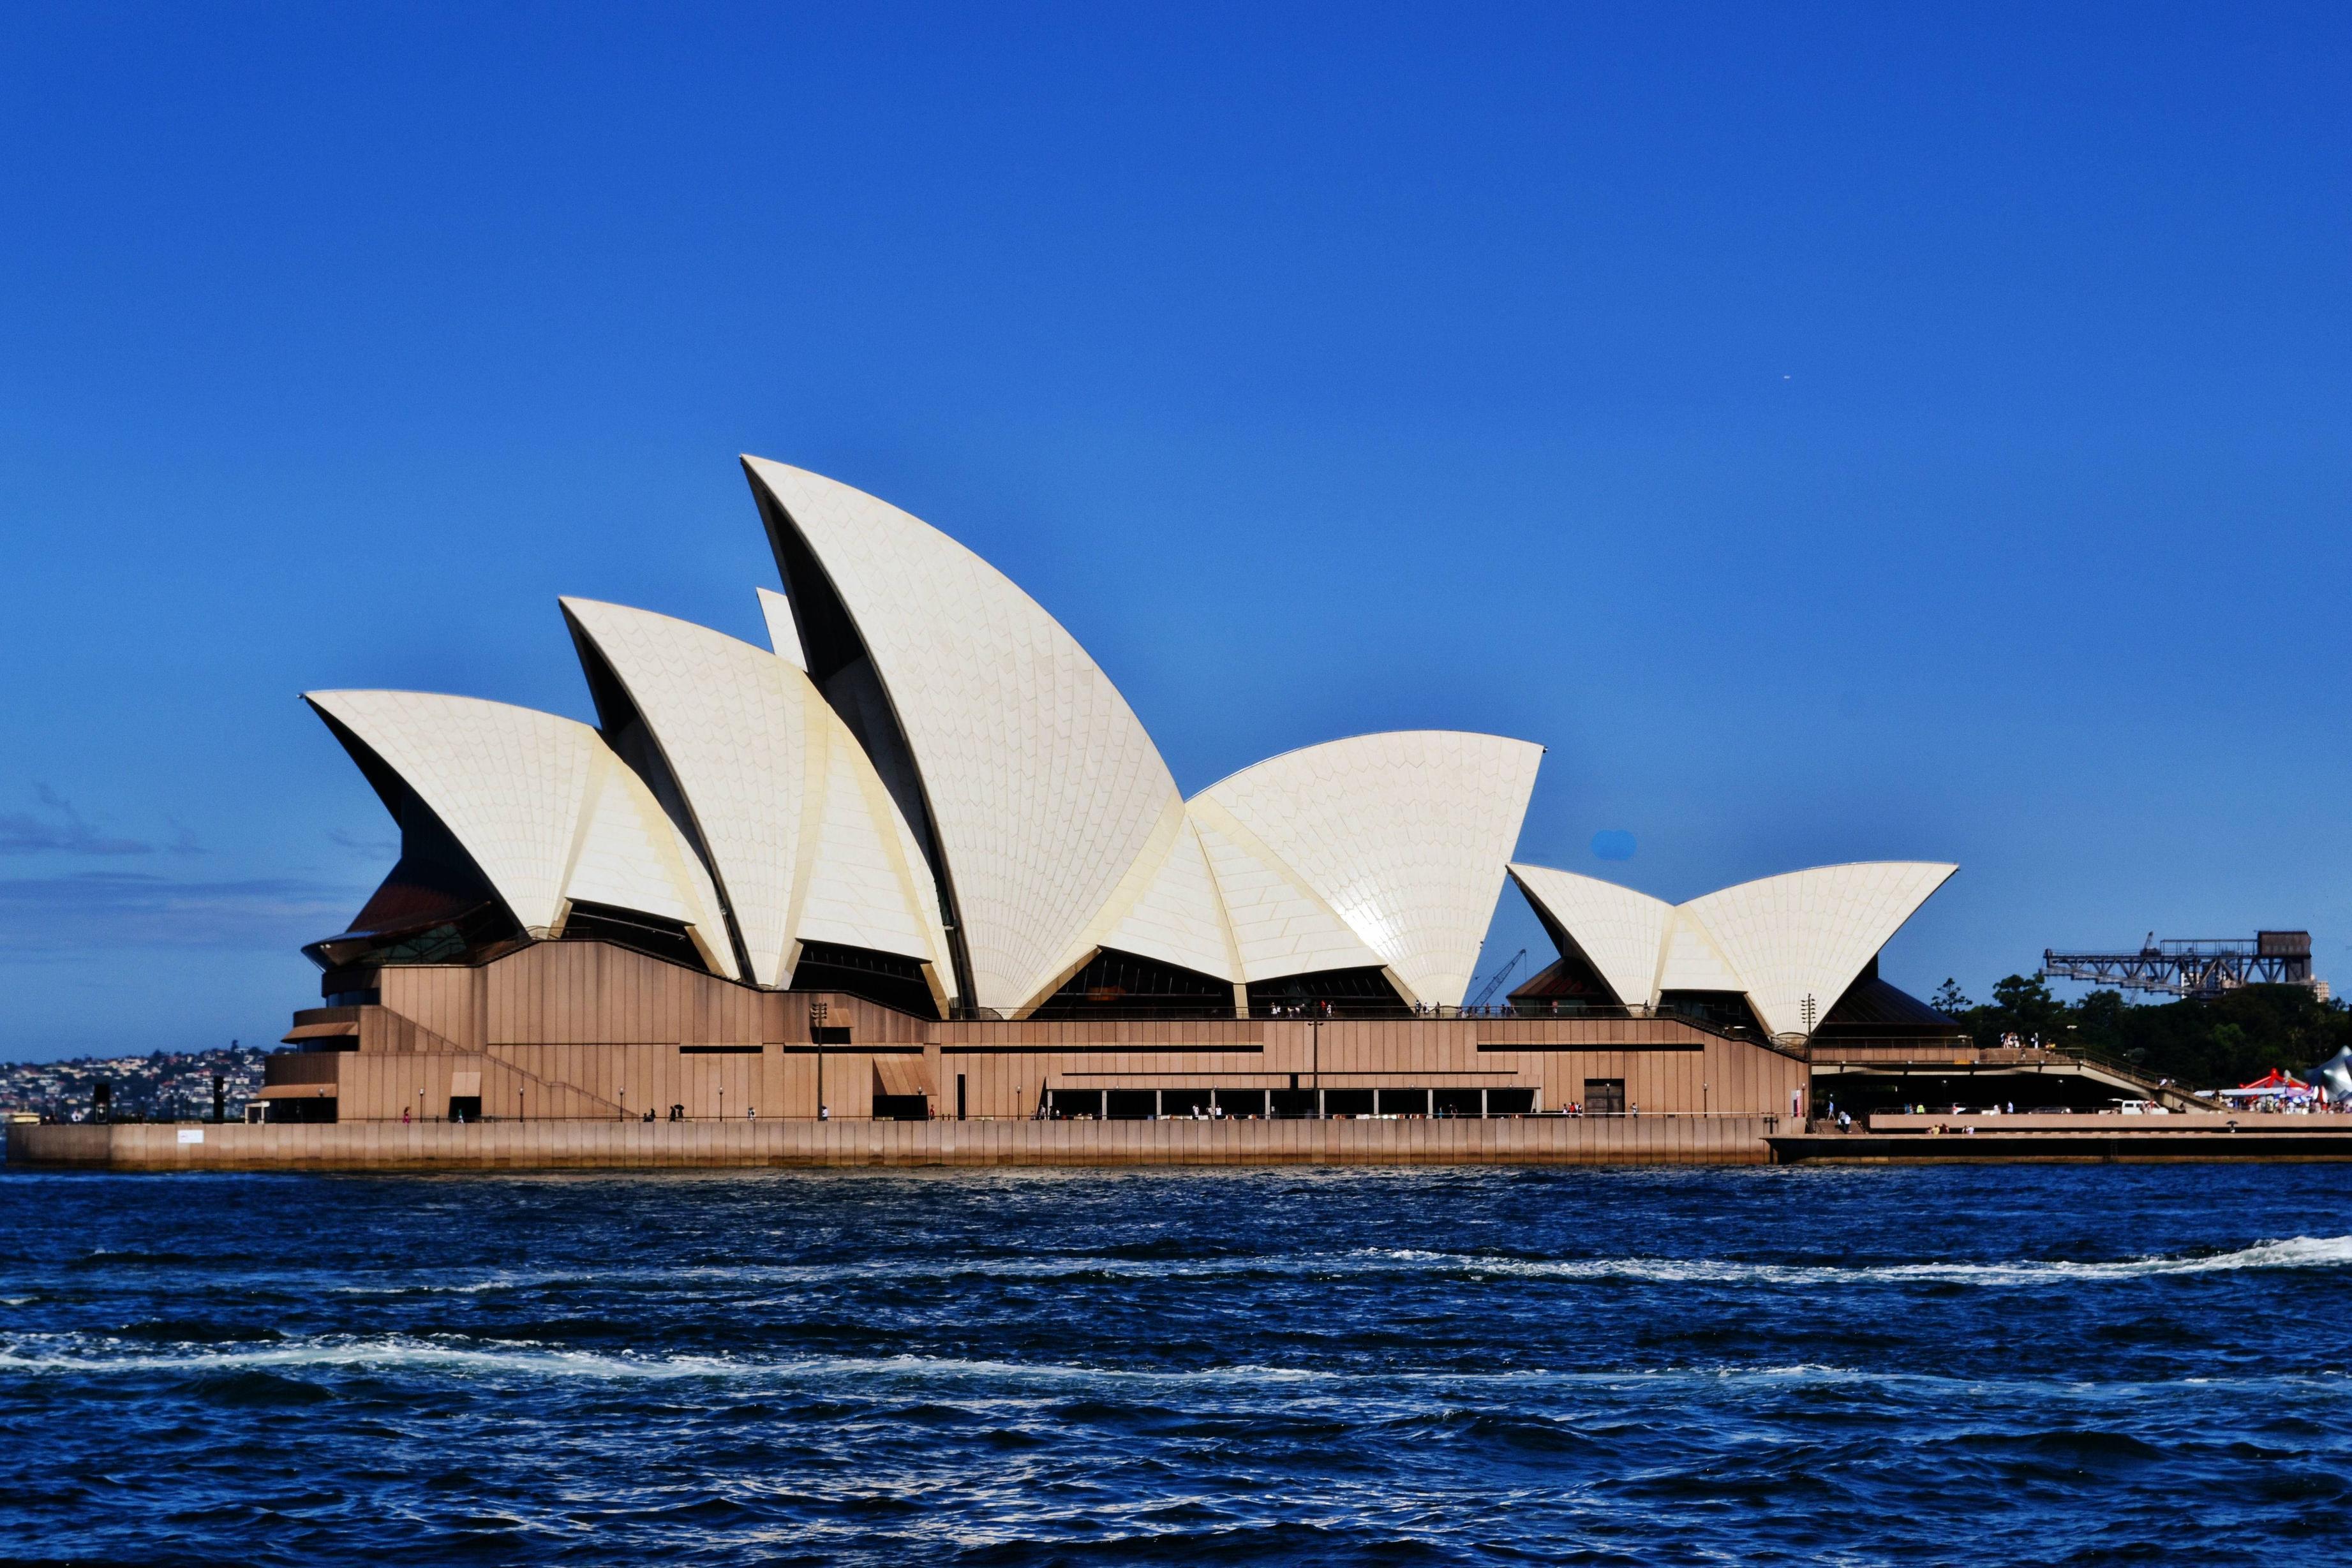 Sydney Opera House Wallpapers 3686x2458